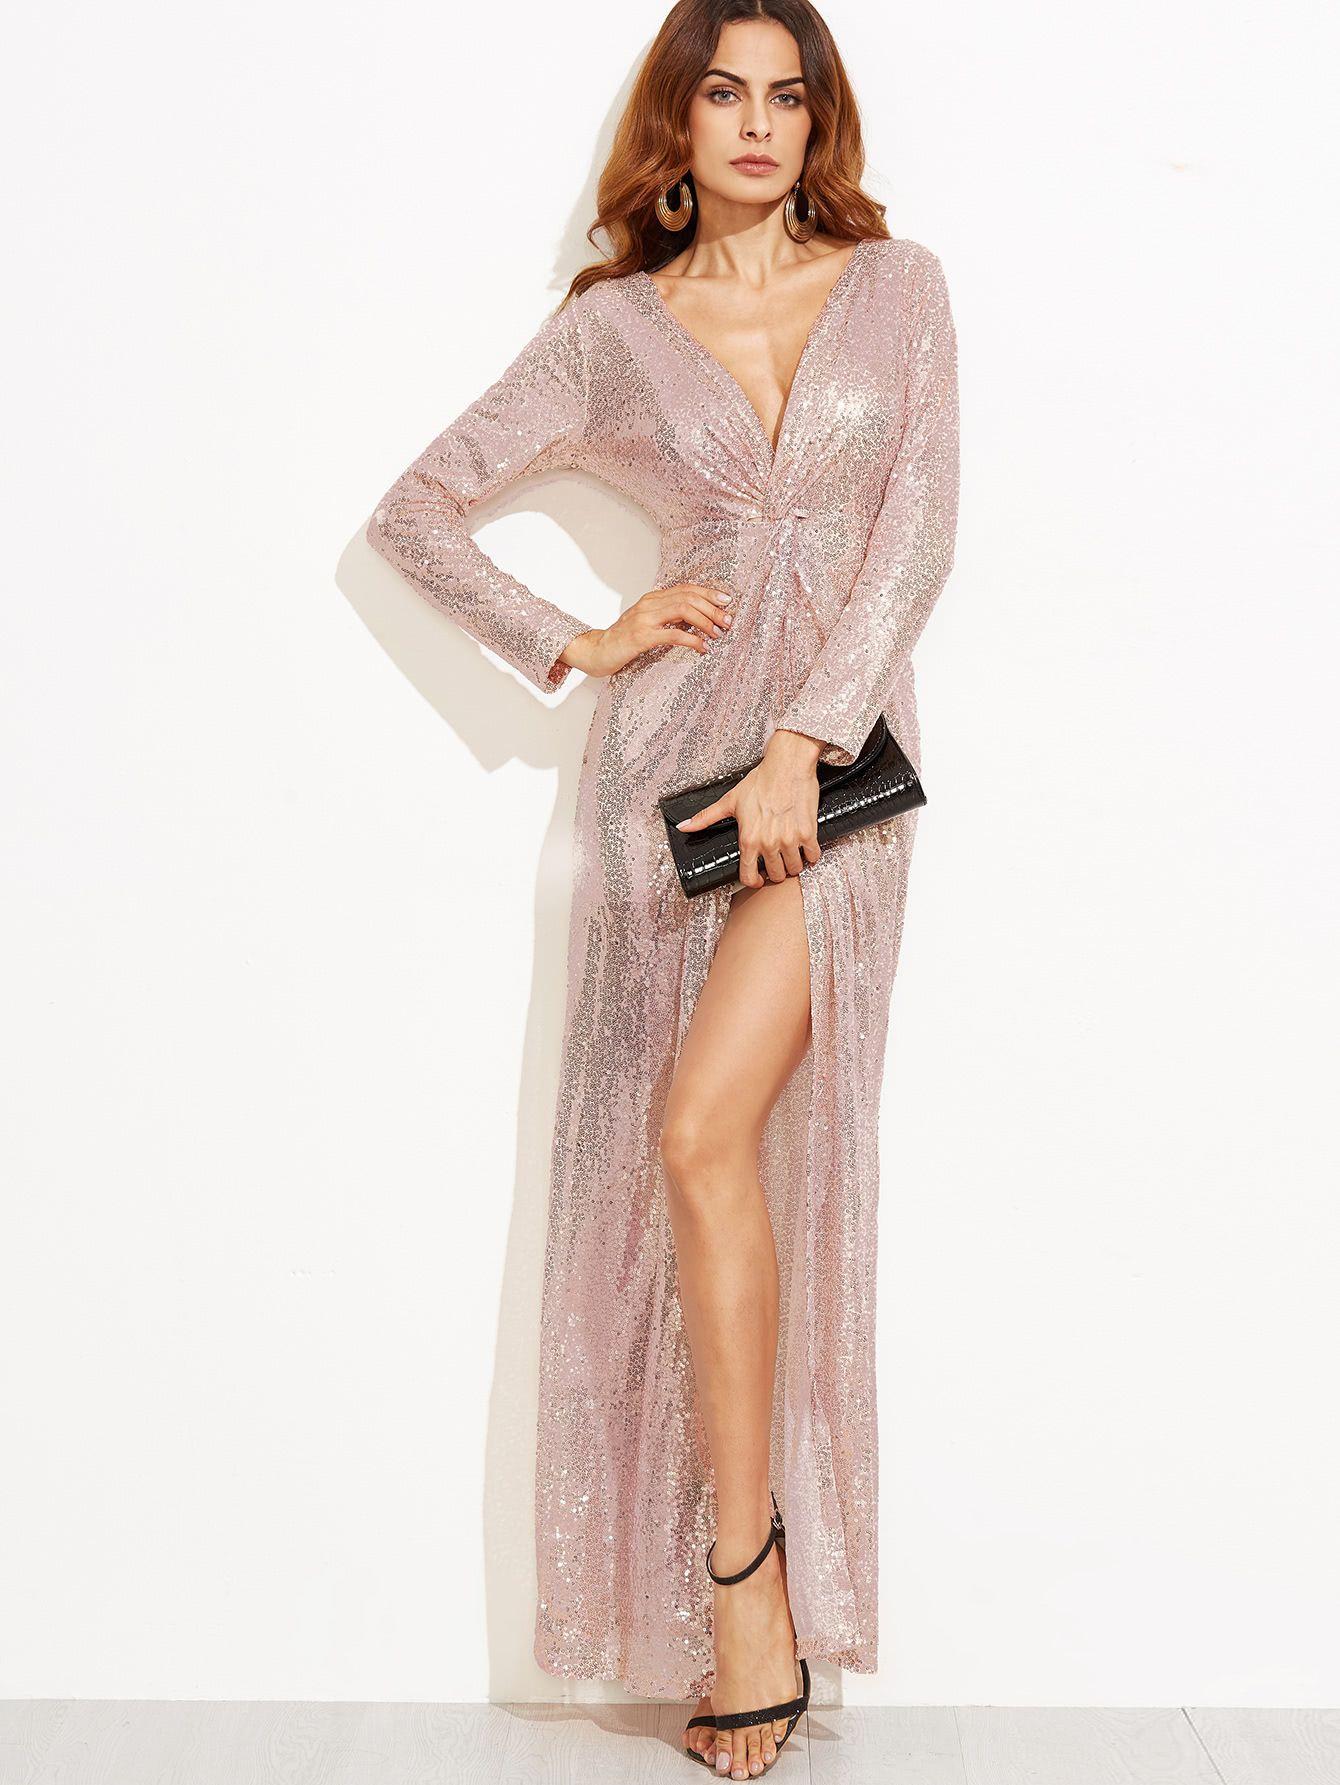 7ed2998a68c9 2017new Sexy Deep V-neck Women Rose Golden Sequin Long Sleeve Slit Maxi Dress  Party Bodycon Dress Wholesale Rose Gold Maxi Dress Sequin Slit Maxi Dress  ...